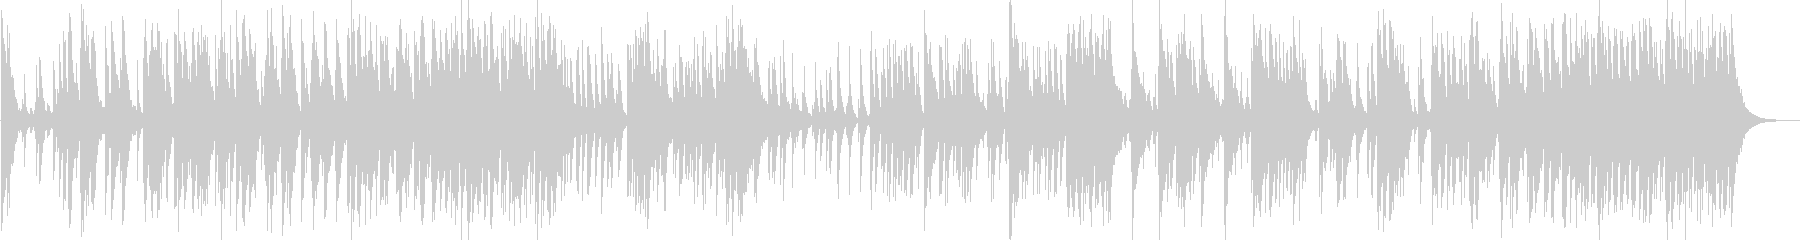 日本伝統音楽3(和太鼓)の未再生の波形